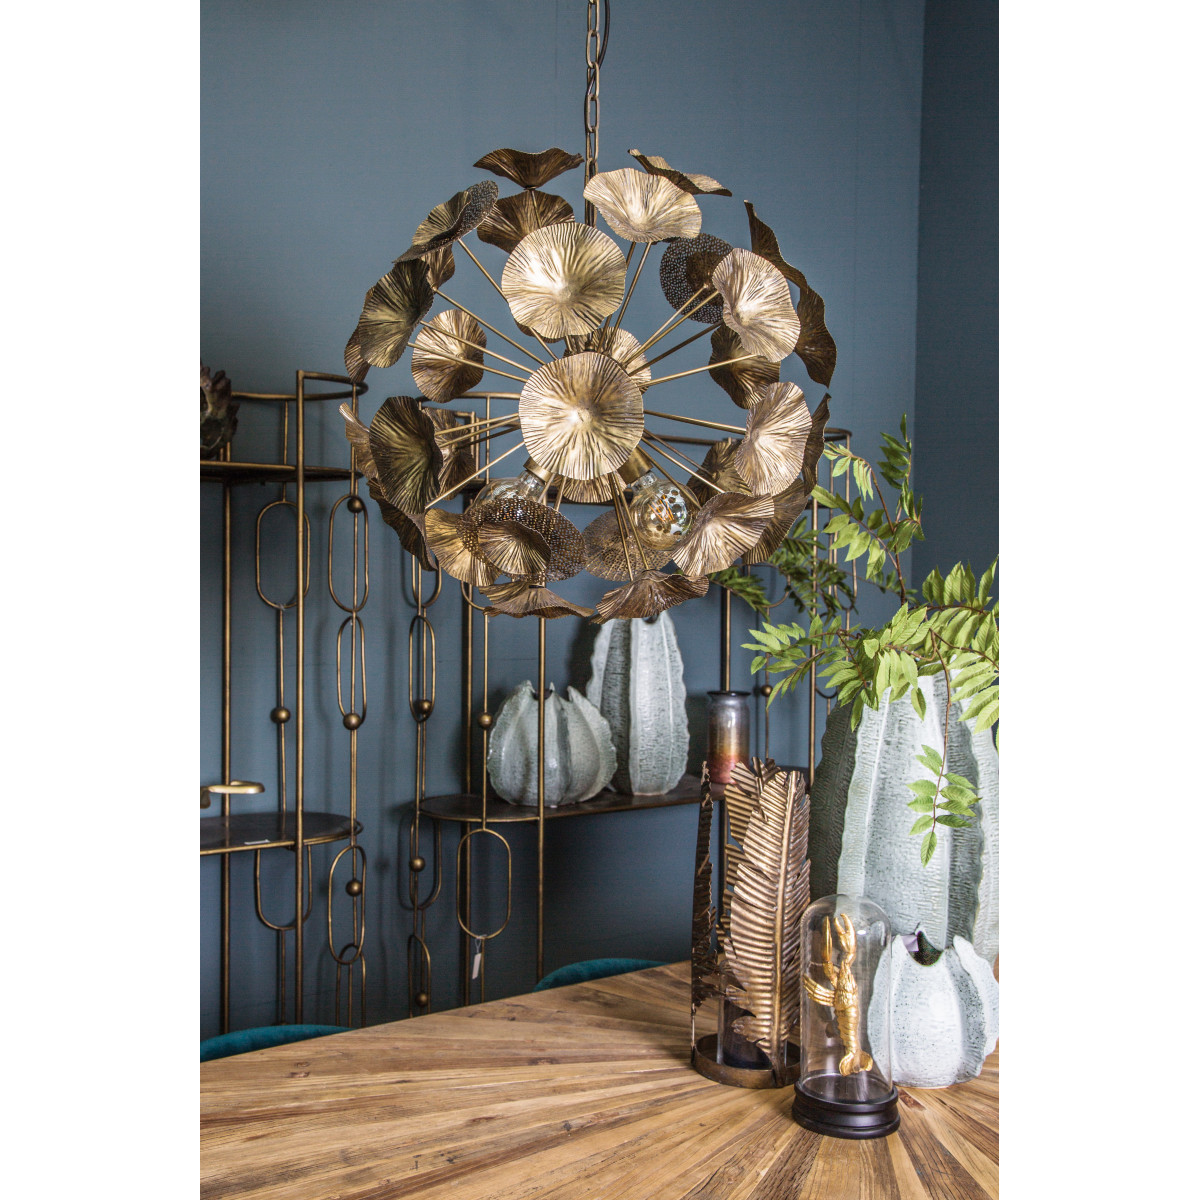 PTMD Marthe Gold hanglamp bloemen